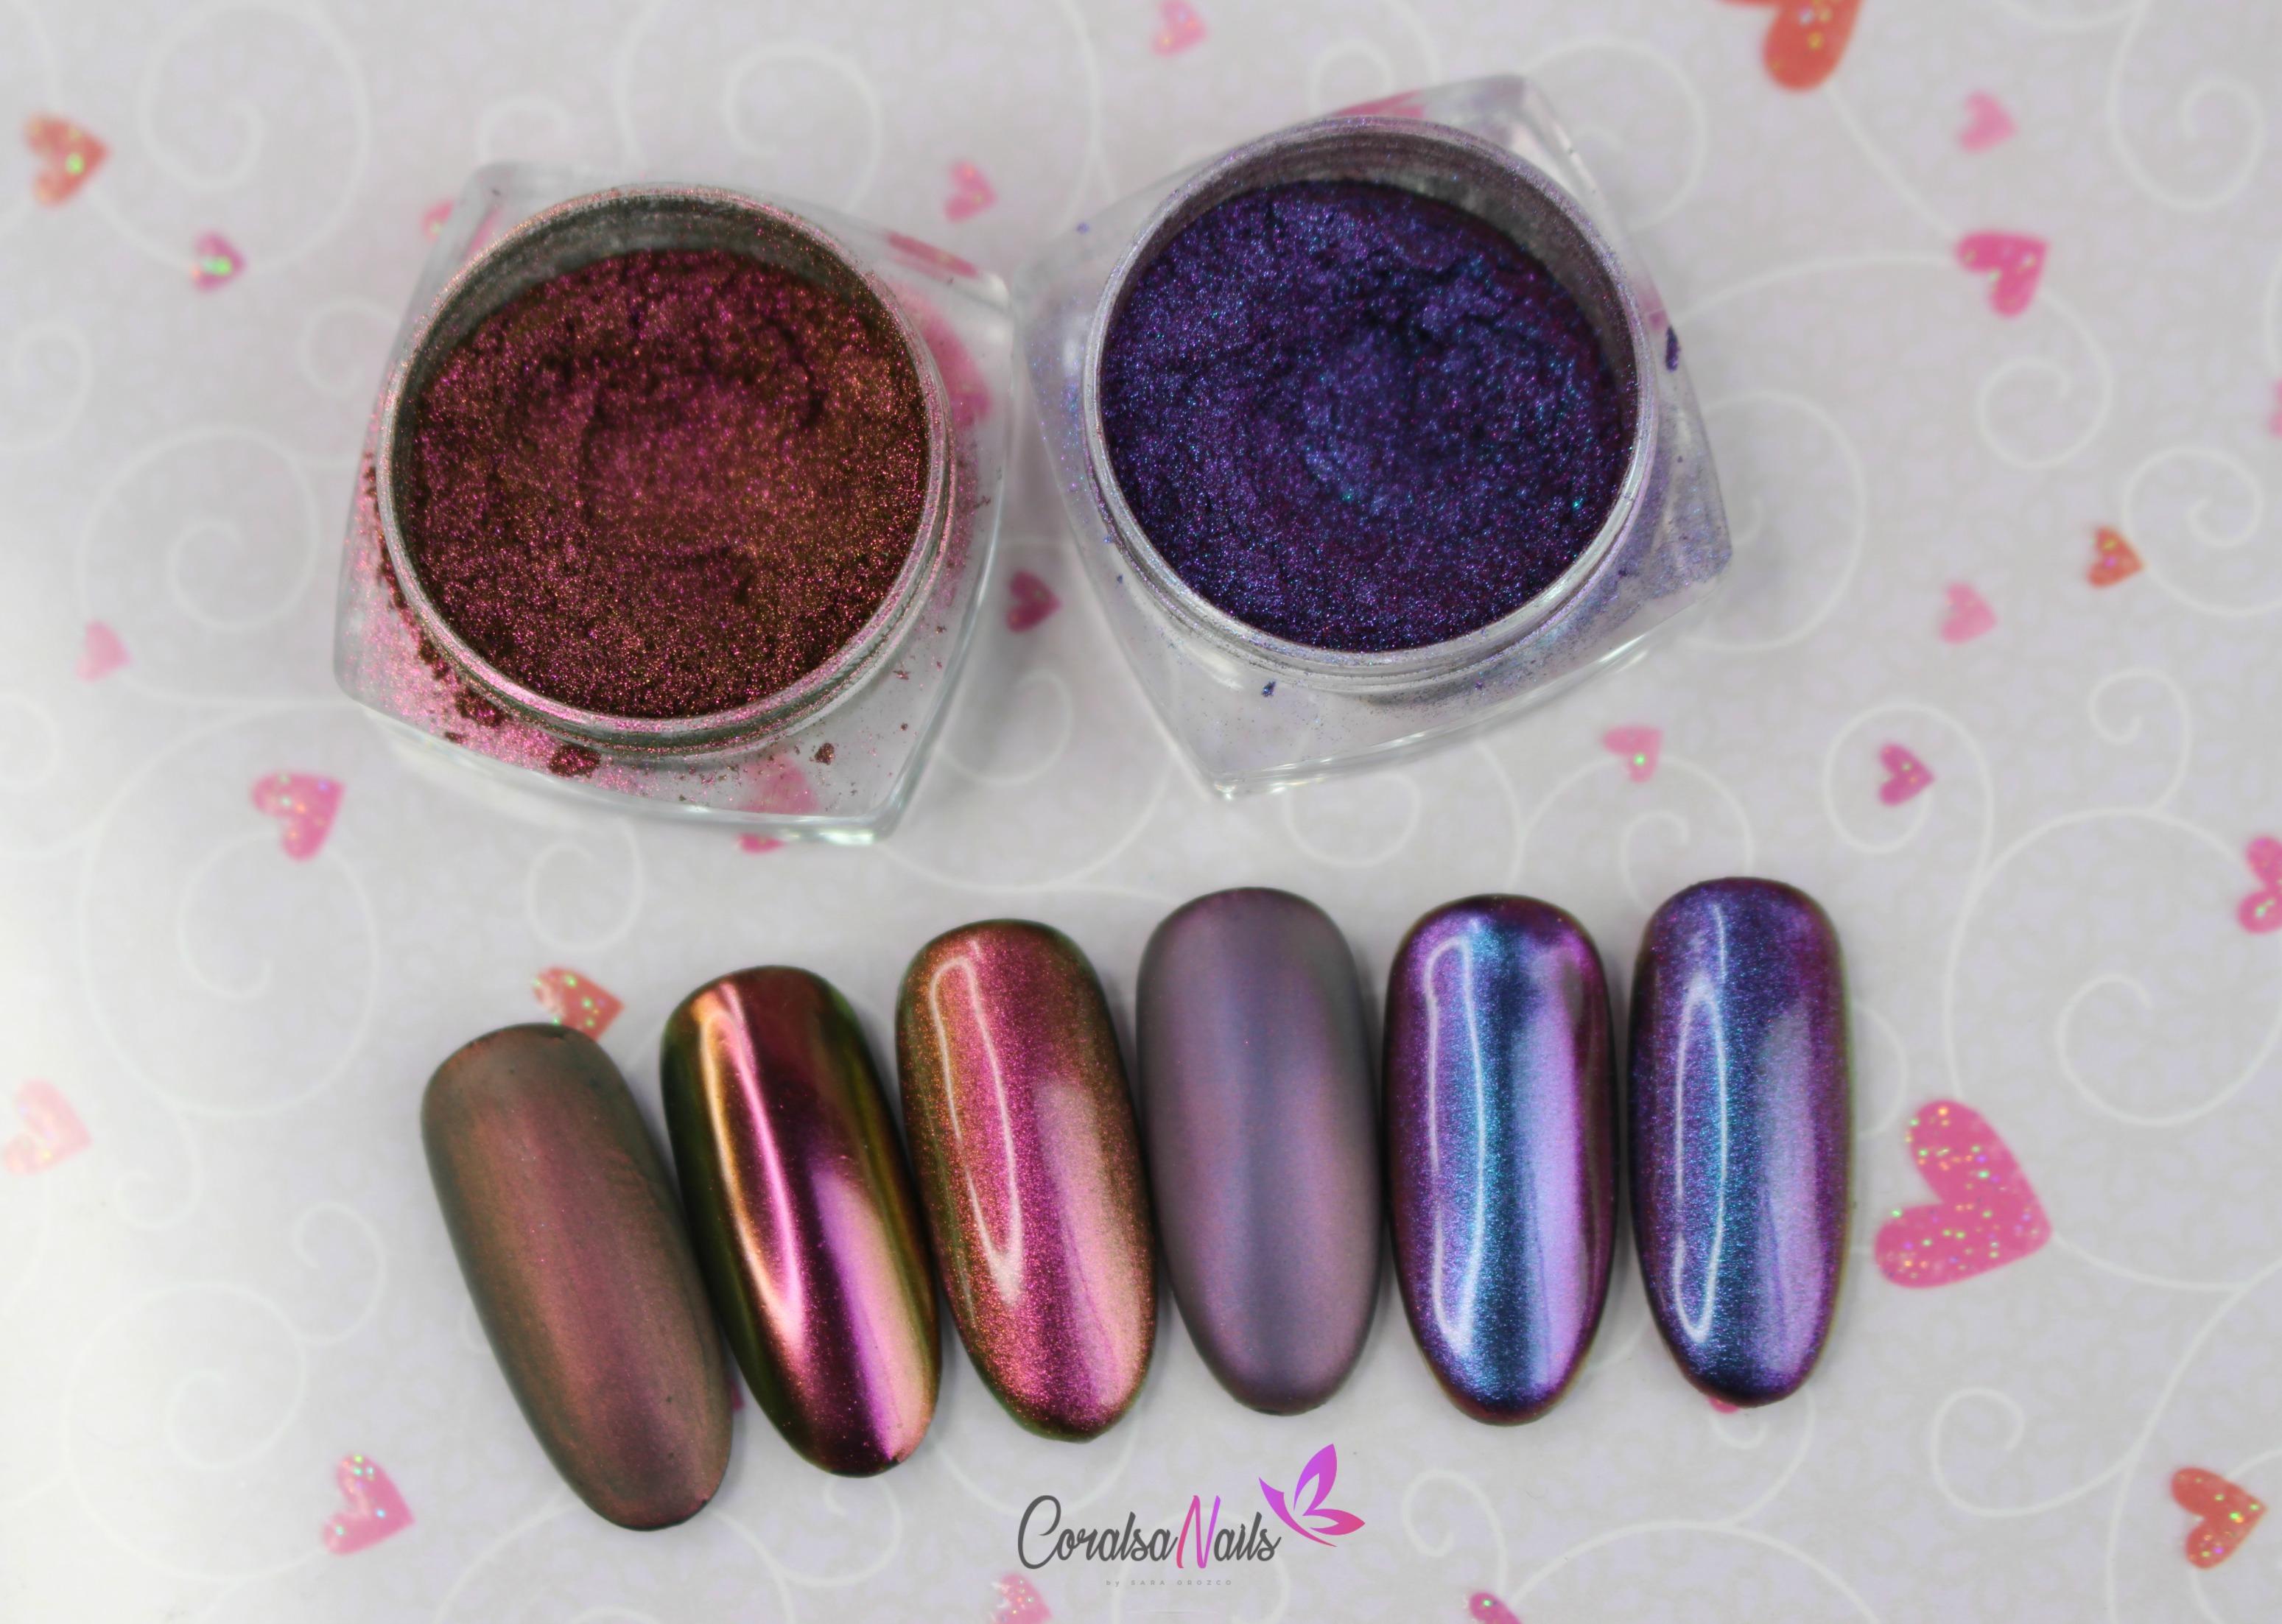 Como aplicar Pigmentos (Distintos Efectos)